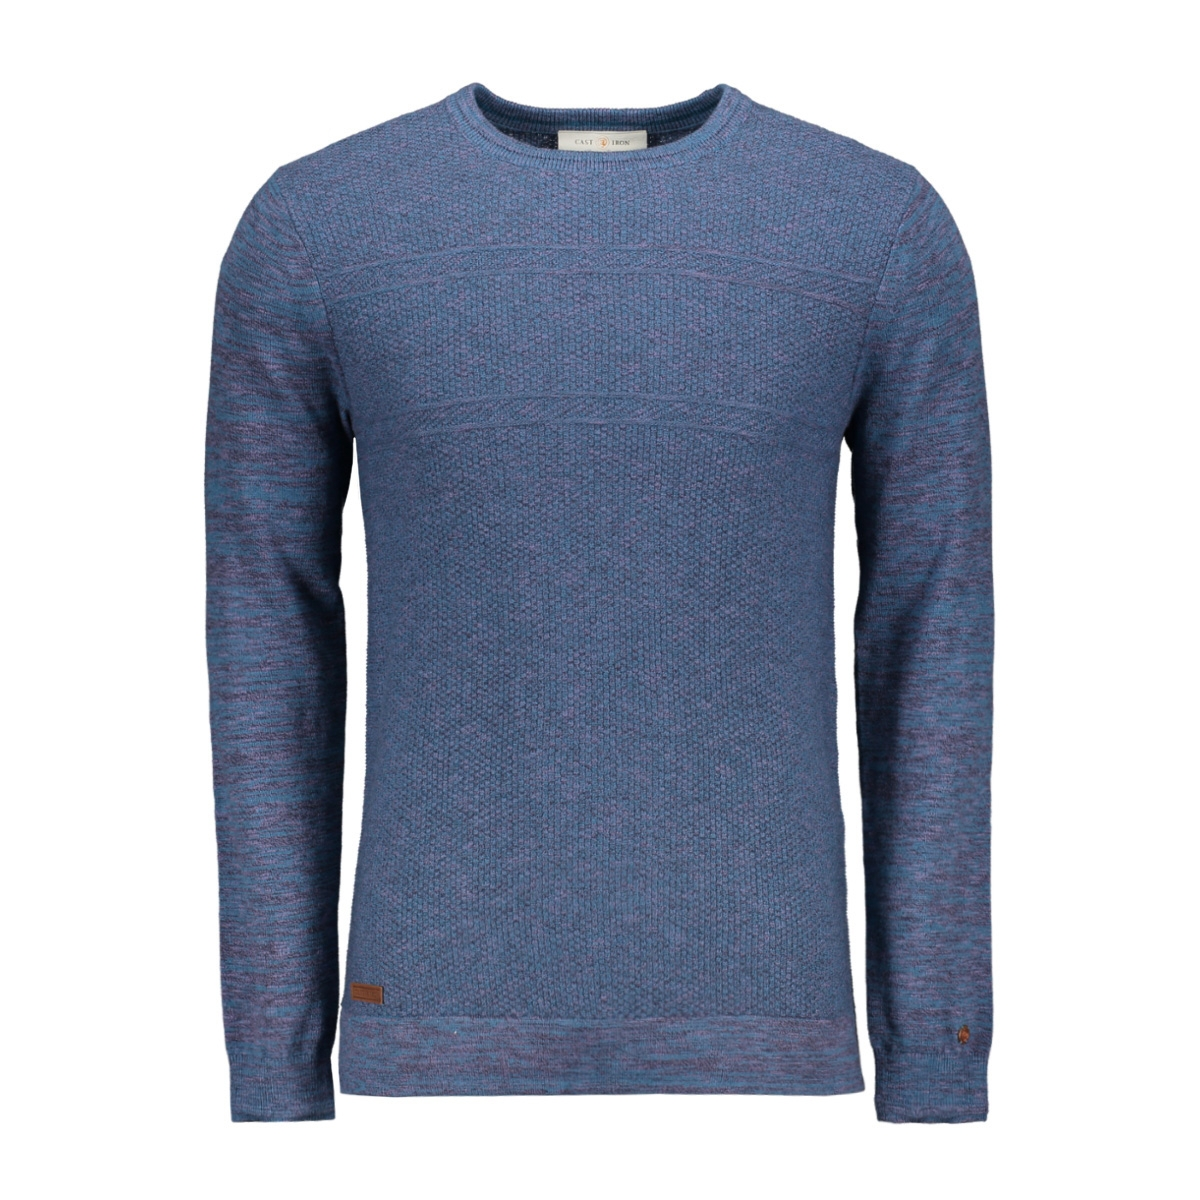 cotton melange knit pullover ckw195401 cast iron trui 5233